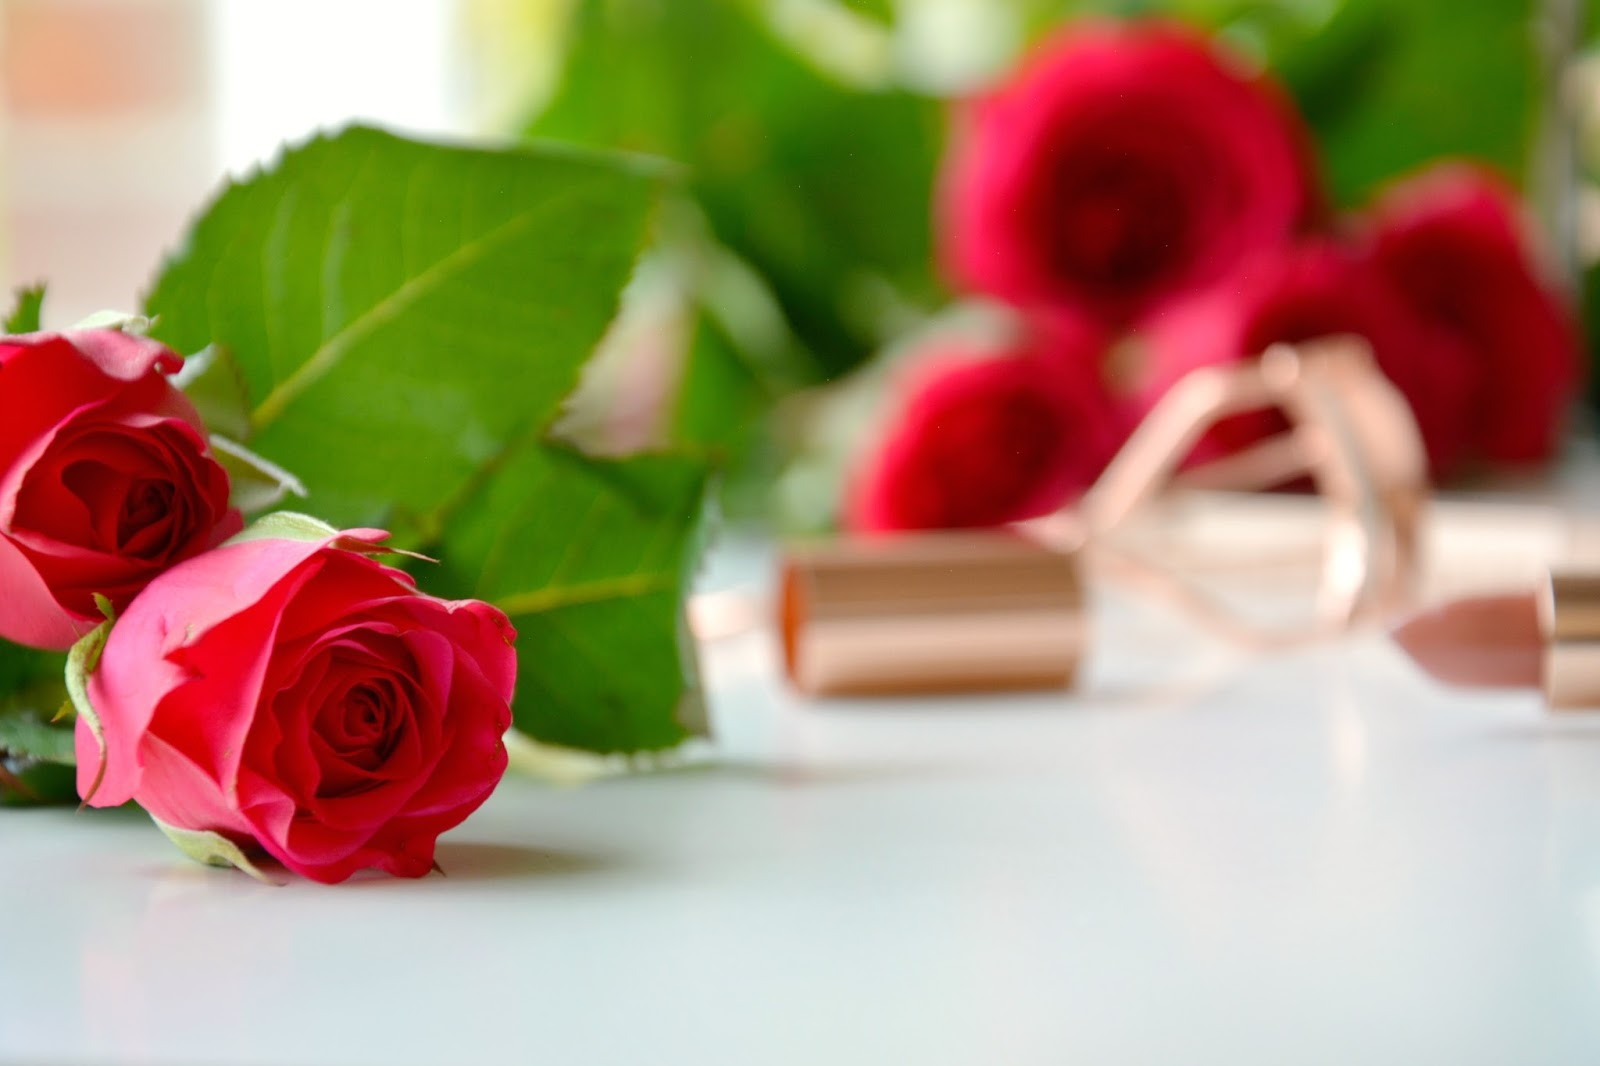 Red Roses; Makeup Revolution Renaissance Lipstick Awaken; Primark Eyelash Curler Rosegold